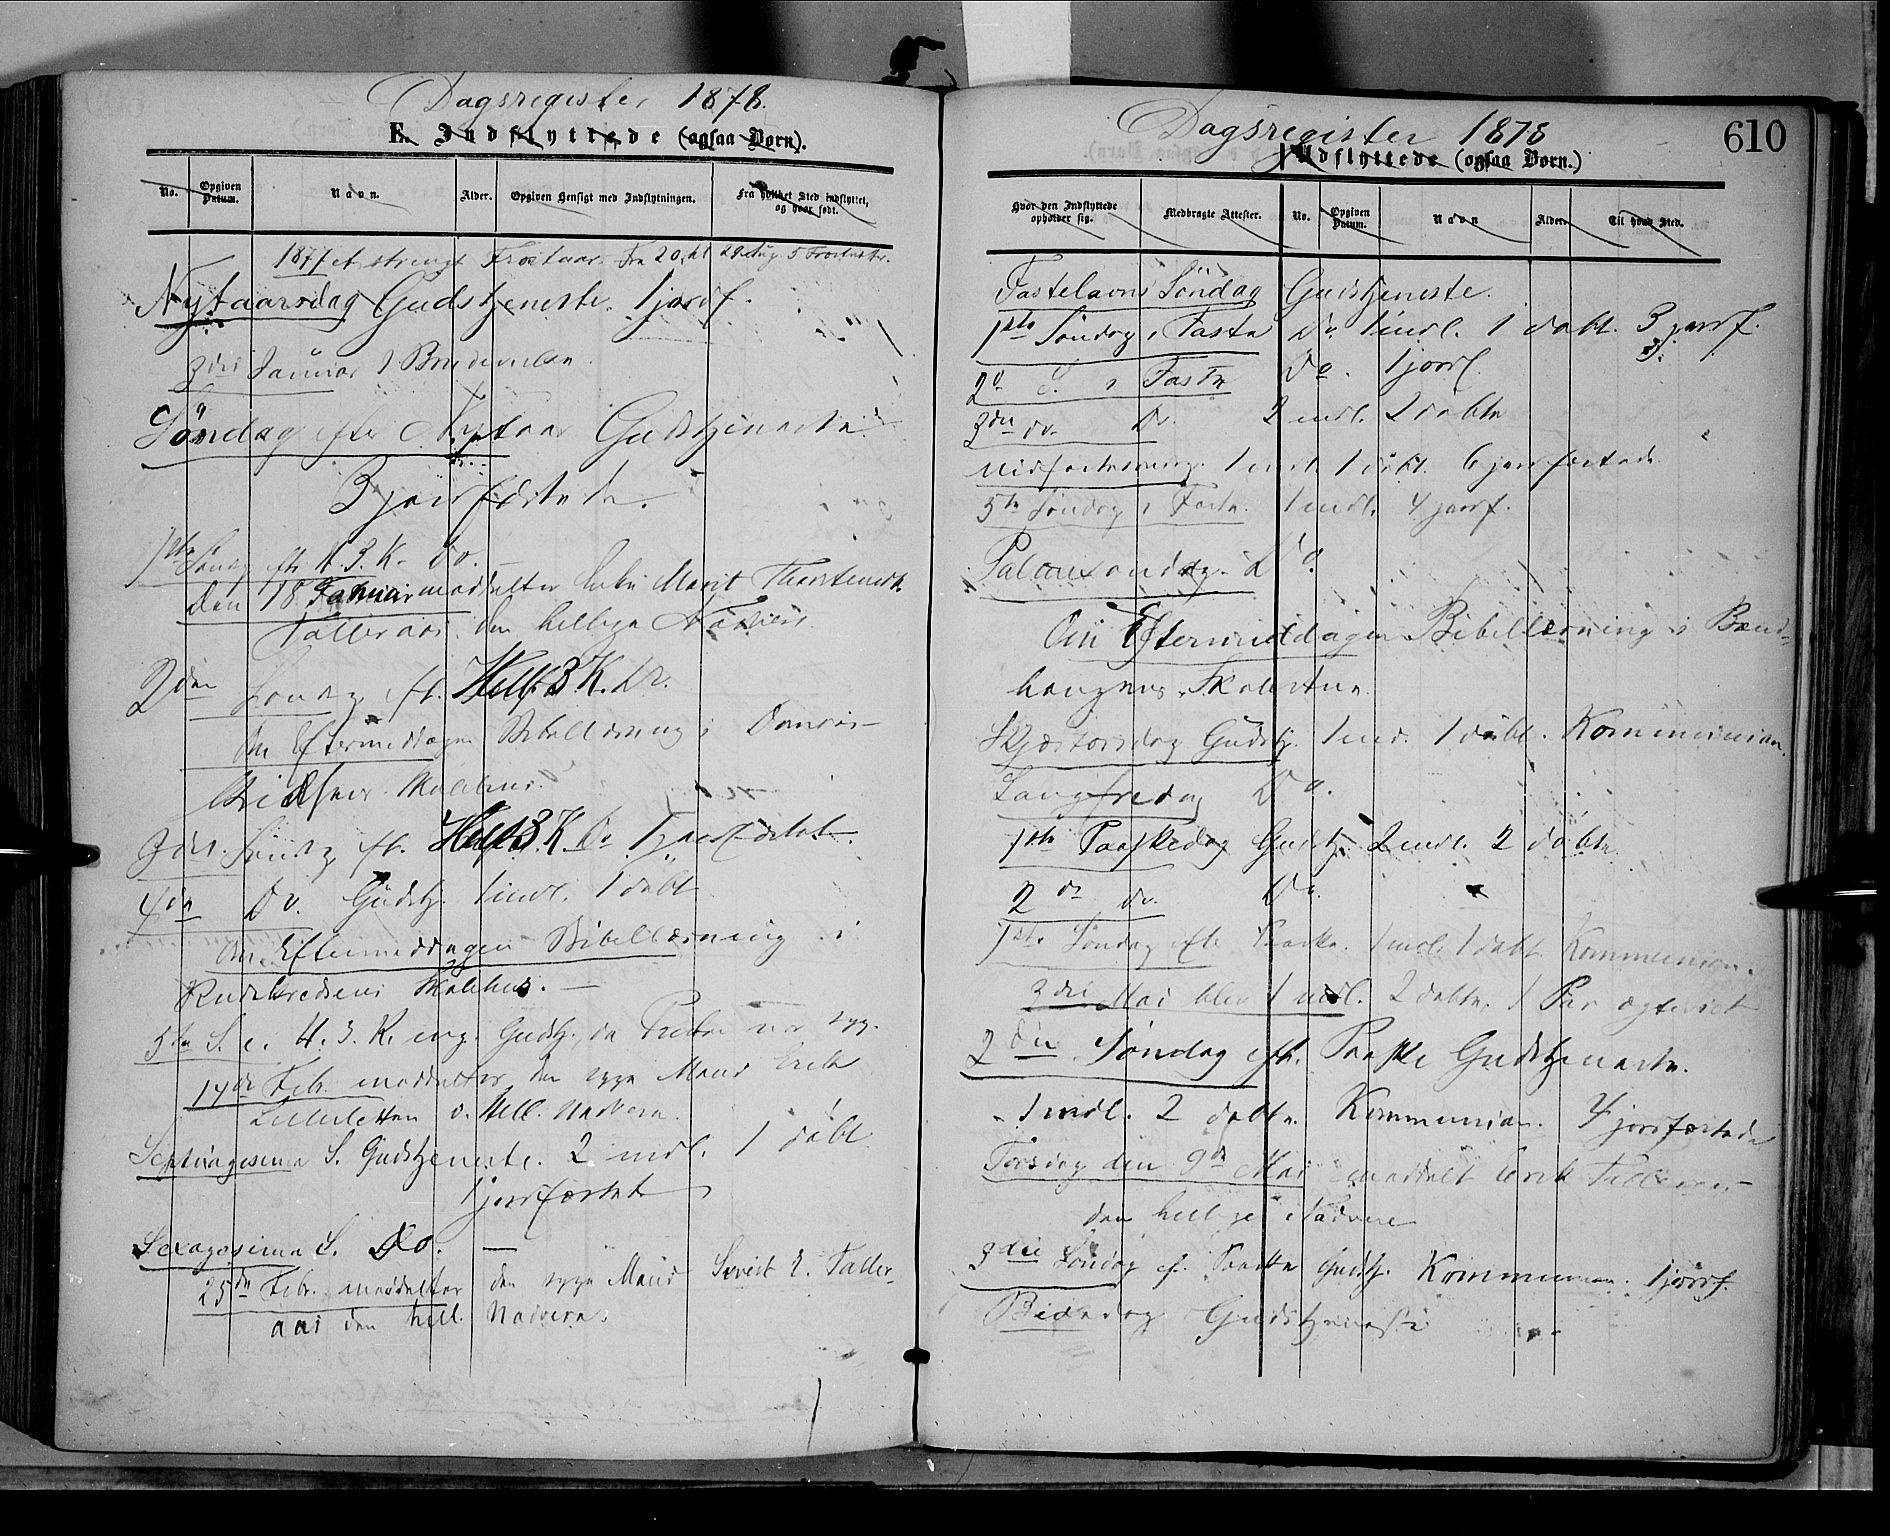 SAH, Dovre prestekontor, Ministerialbok nr. 1, 1854-1878, s. 610